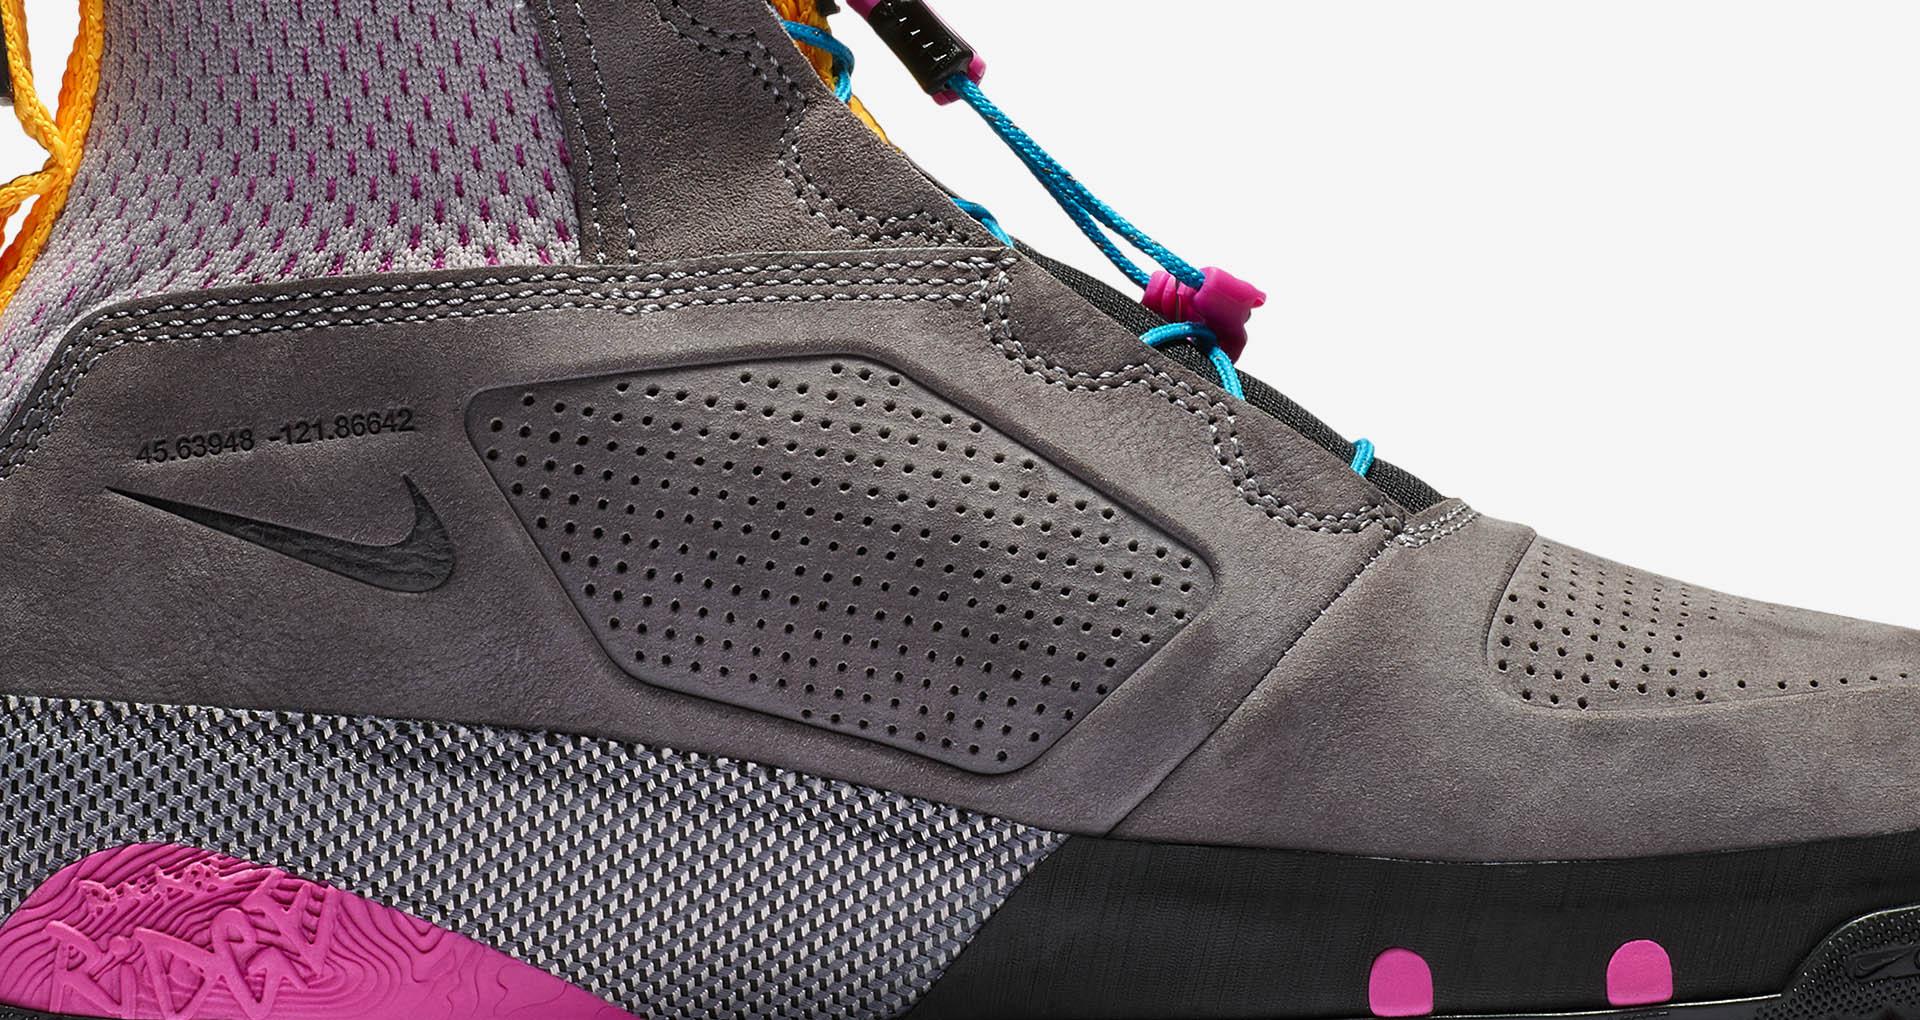 nike acg trekking The Nike Lunar Force 1 Duck Boot. 927a5afa75